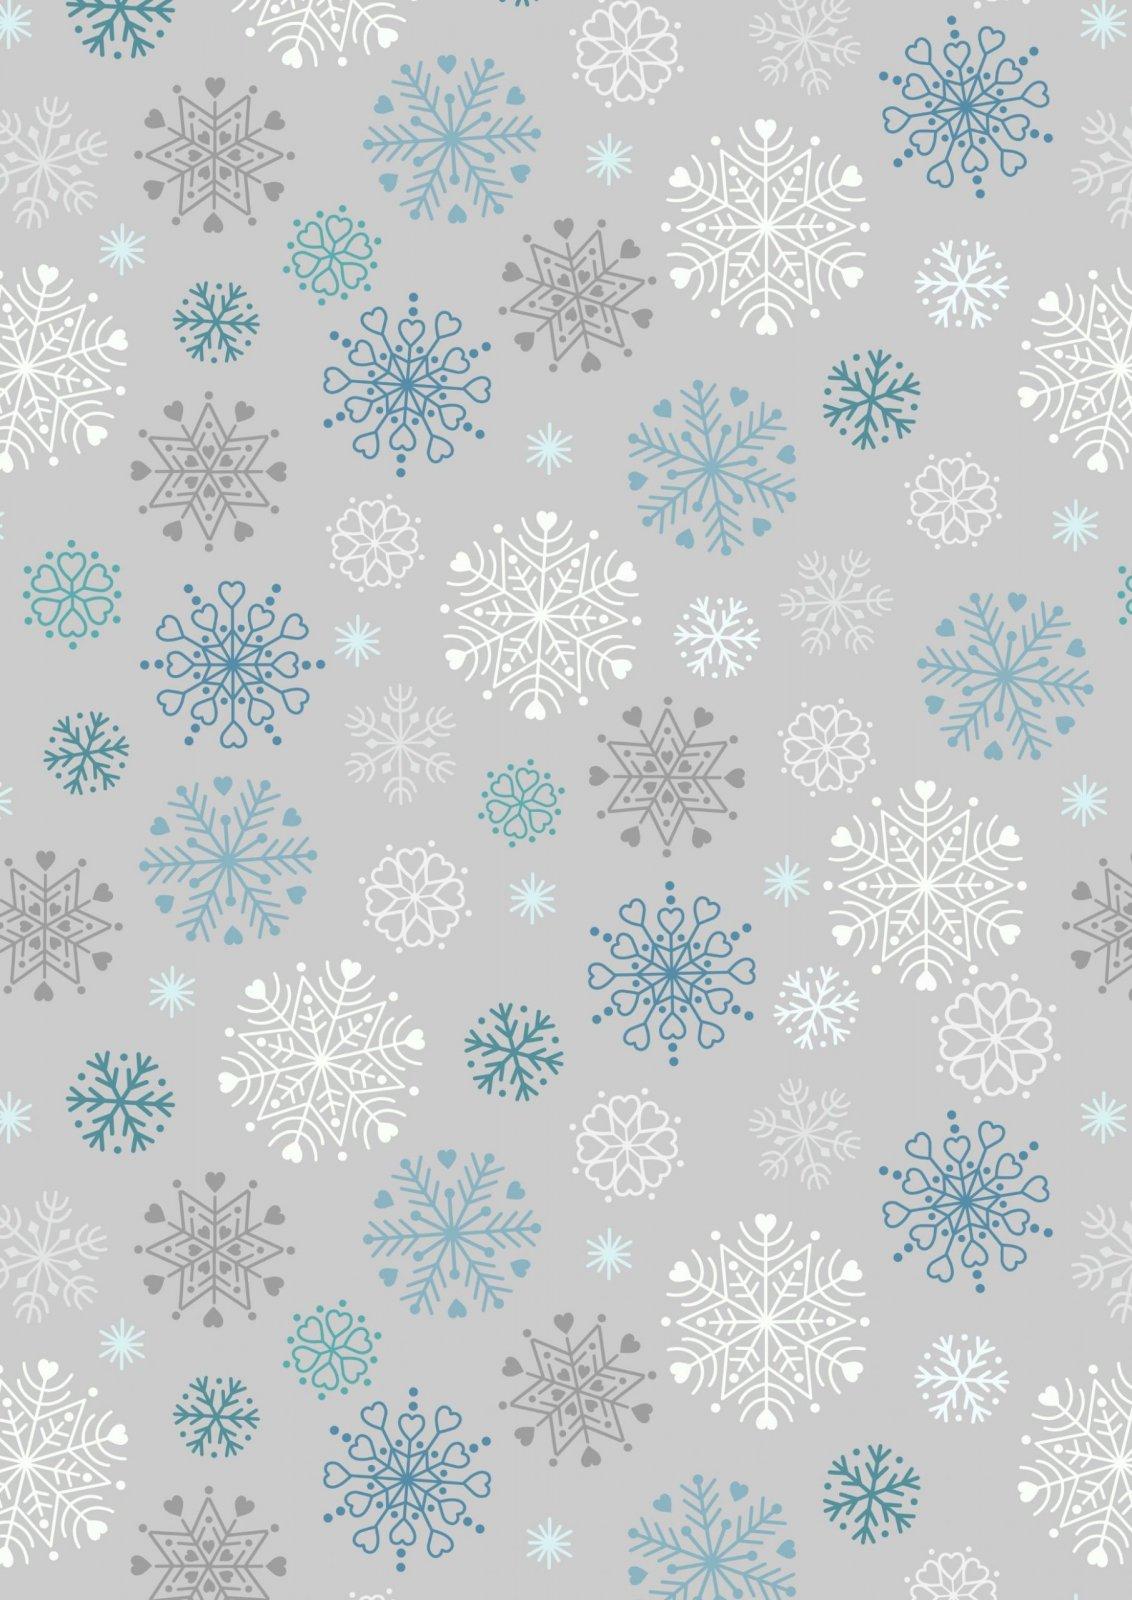 C72.1 Glow in the Dark Snowflakes on Silver Hygge Glow Lewis & Irene